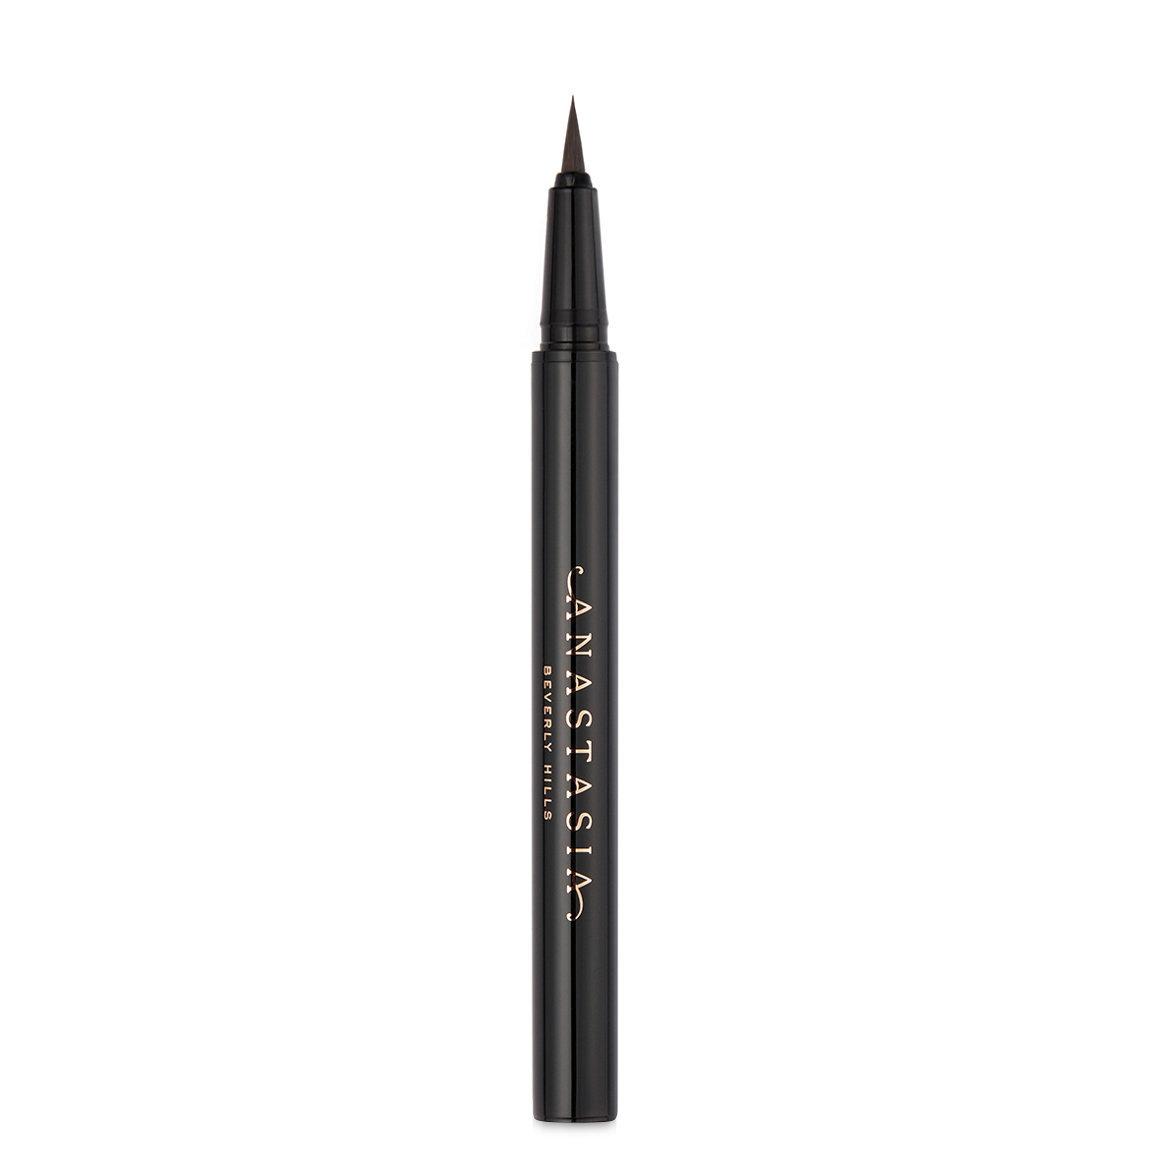 Anastasia Beverly Hills Micro-Stroking Detailing Brow Pen Blonde alternative view 1.